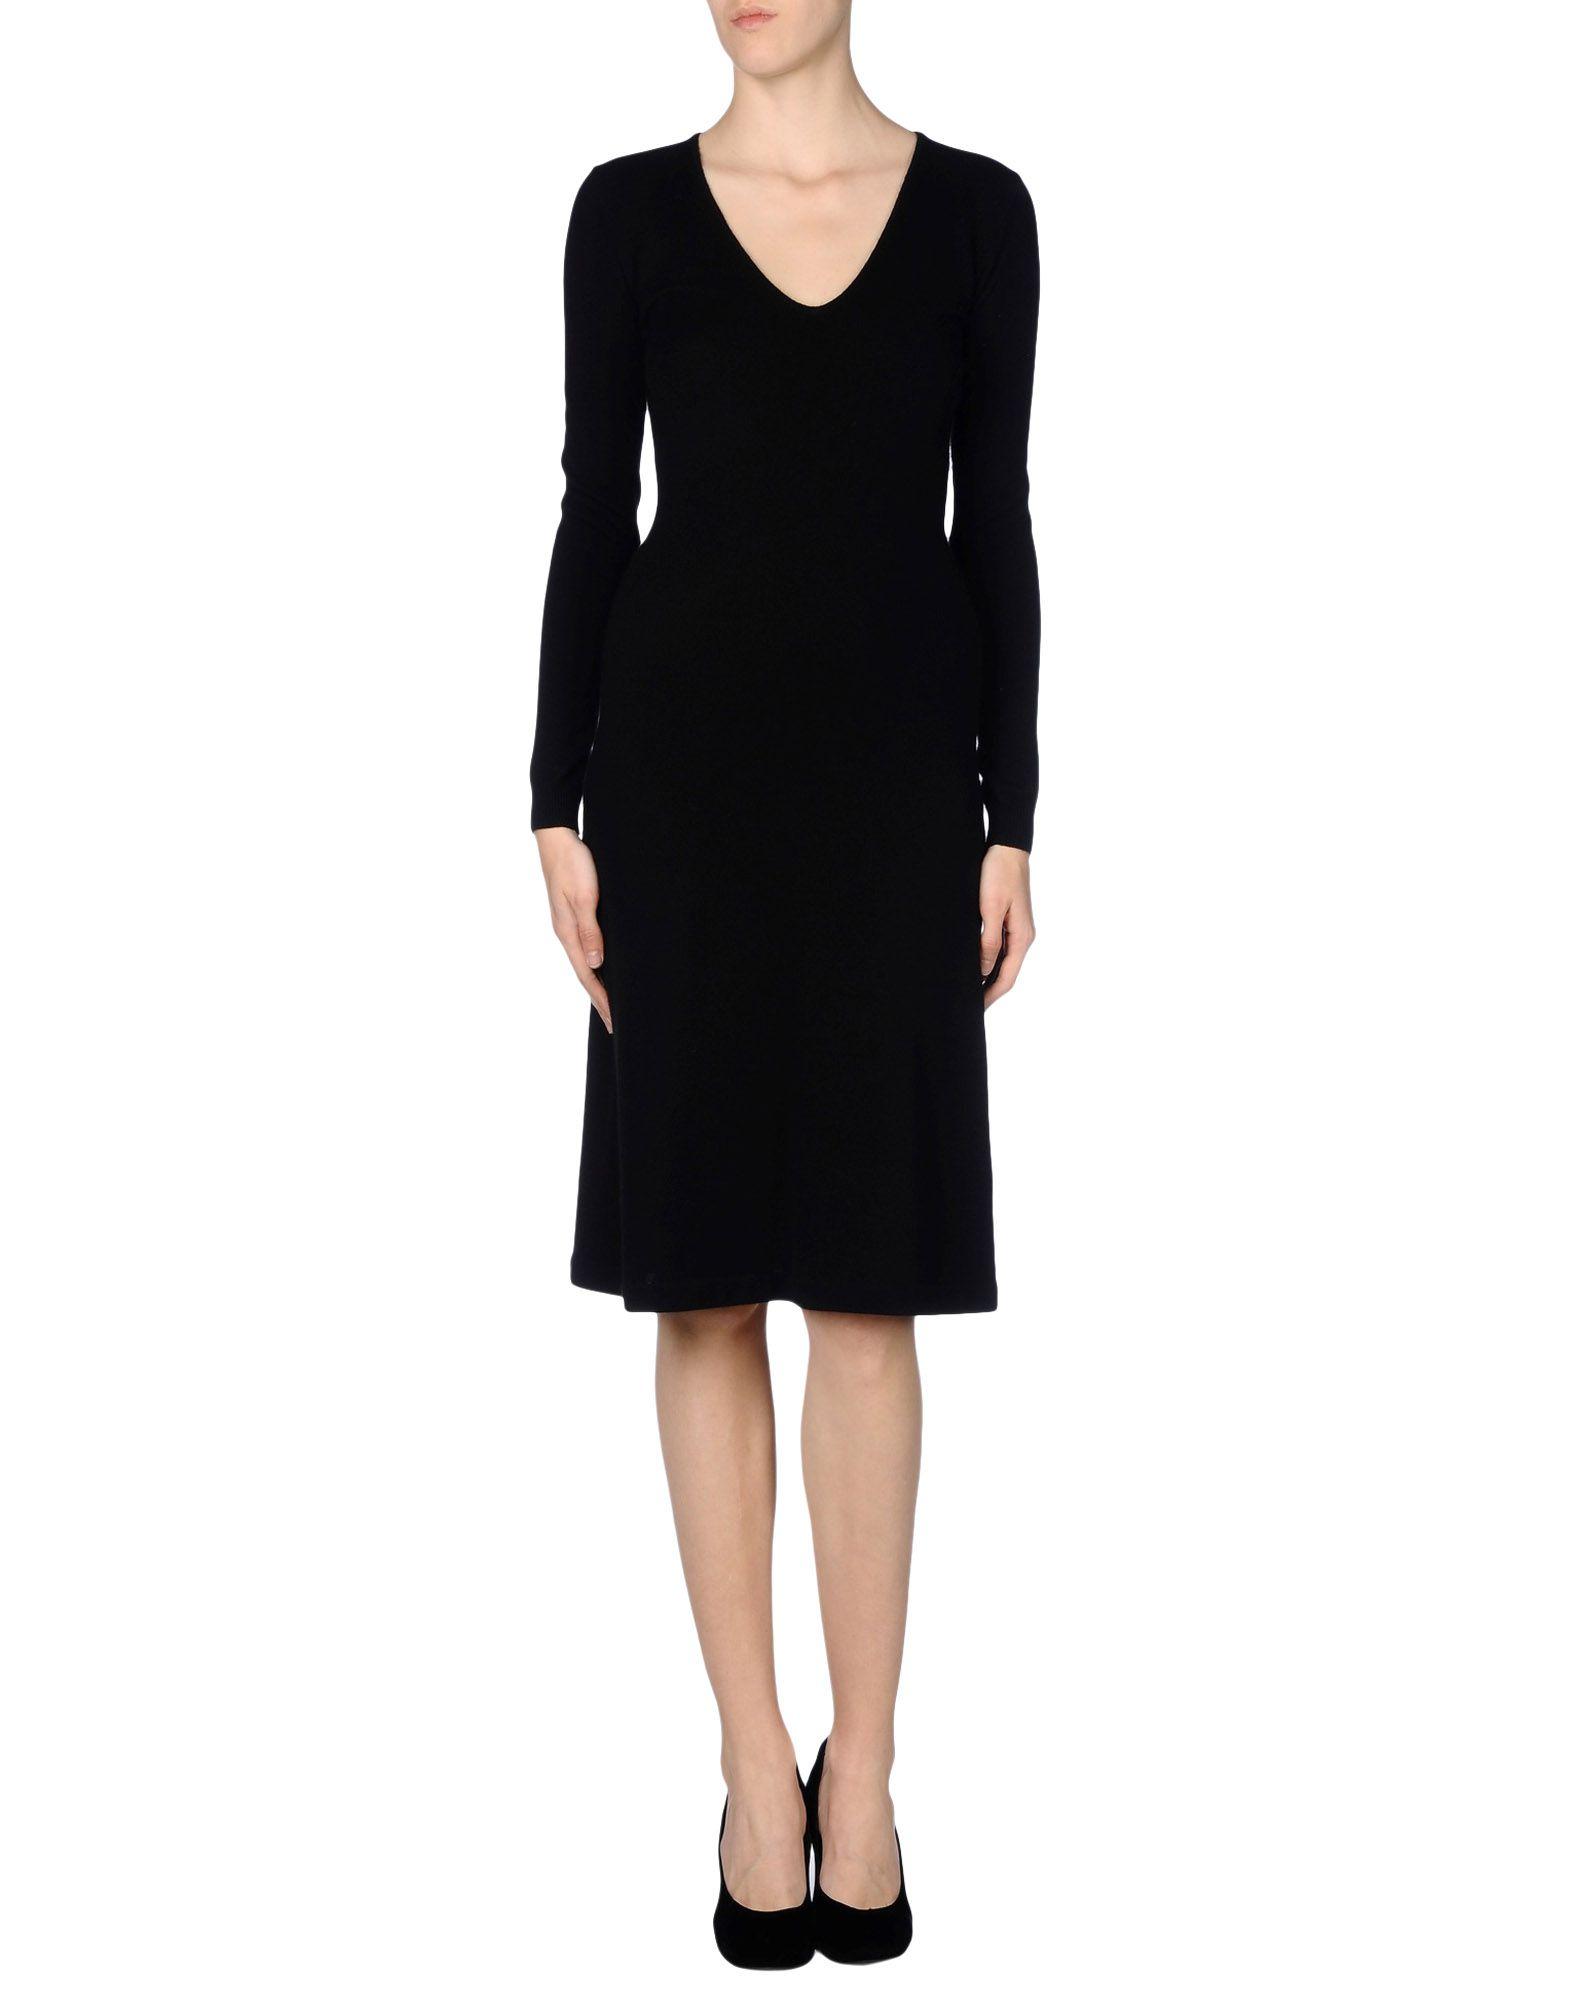 Ralph lauren black label knee length dress in black lyst